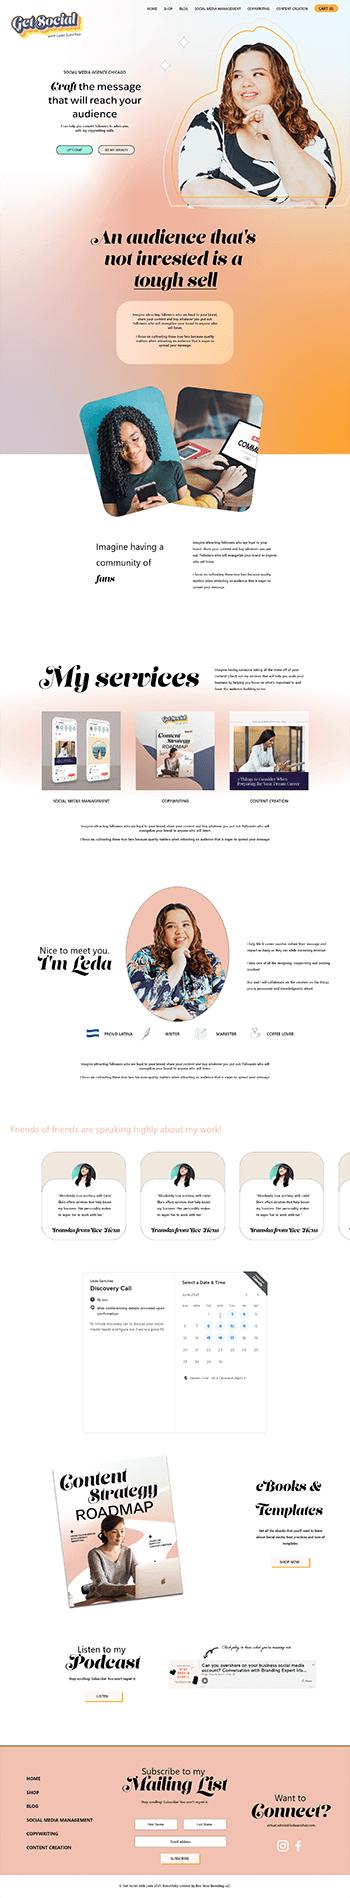 Portfolio Website Design Social Media Agency